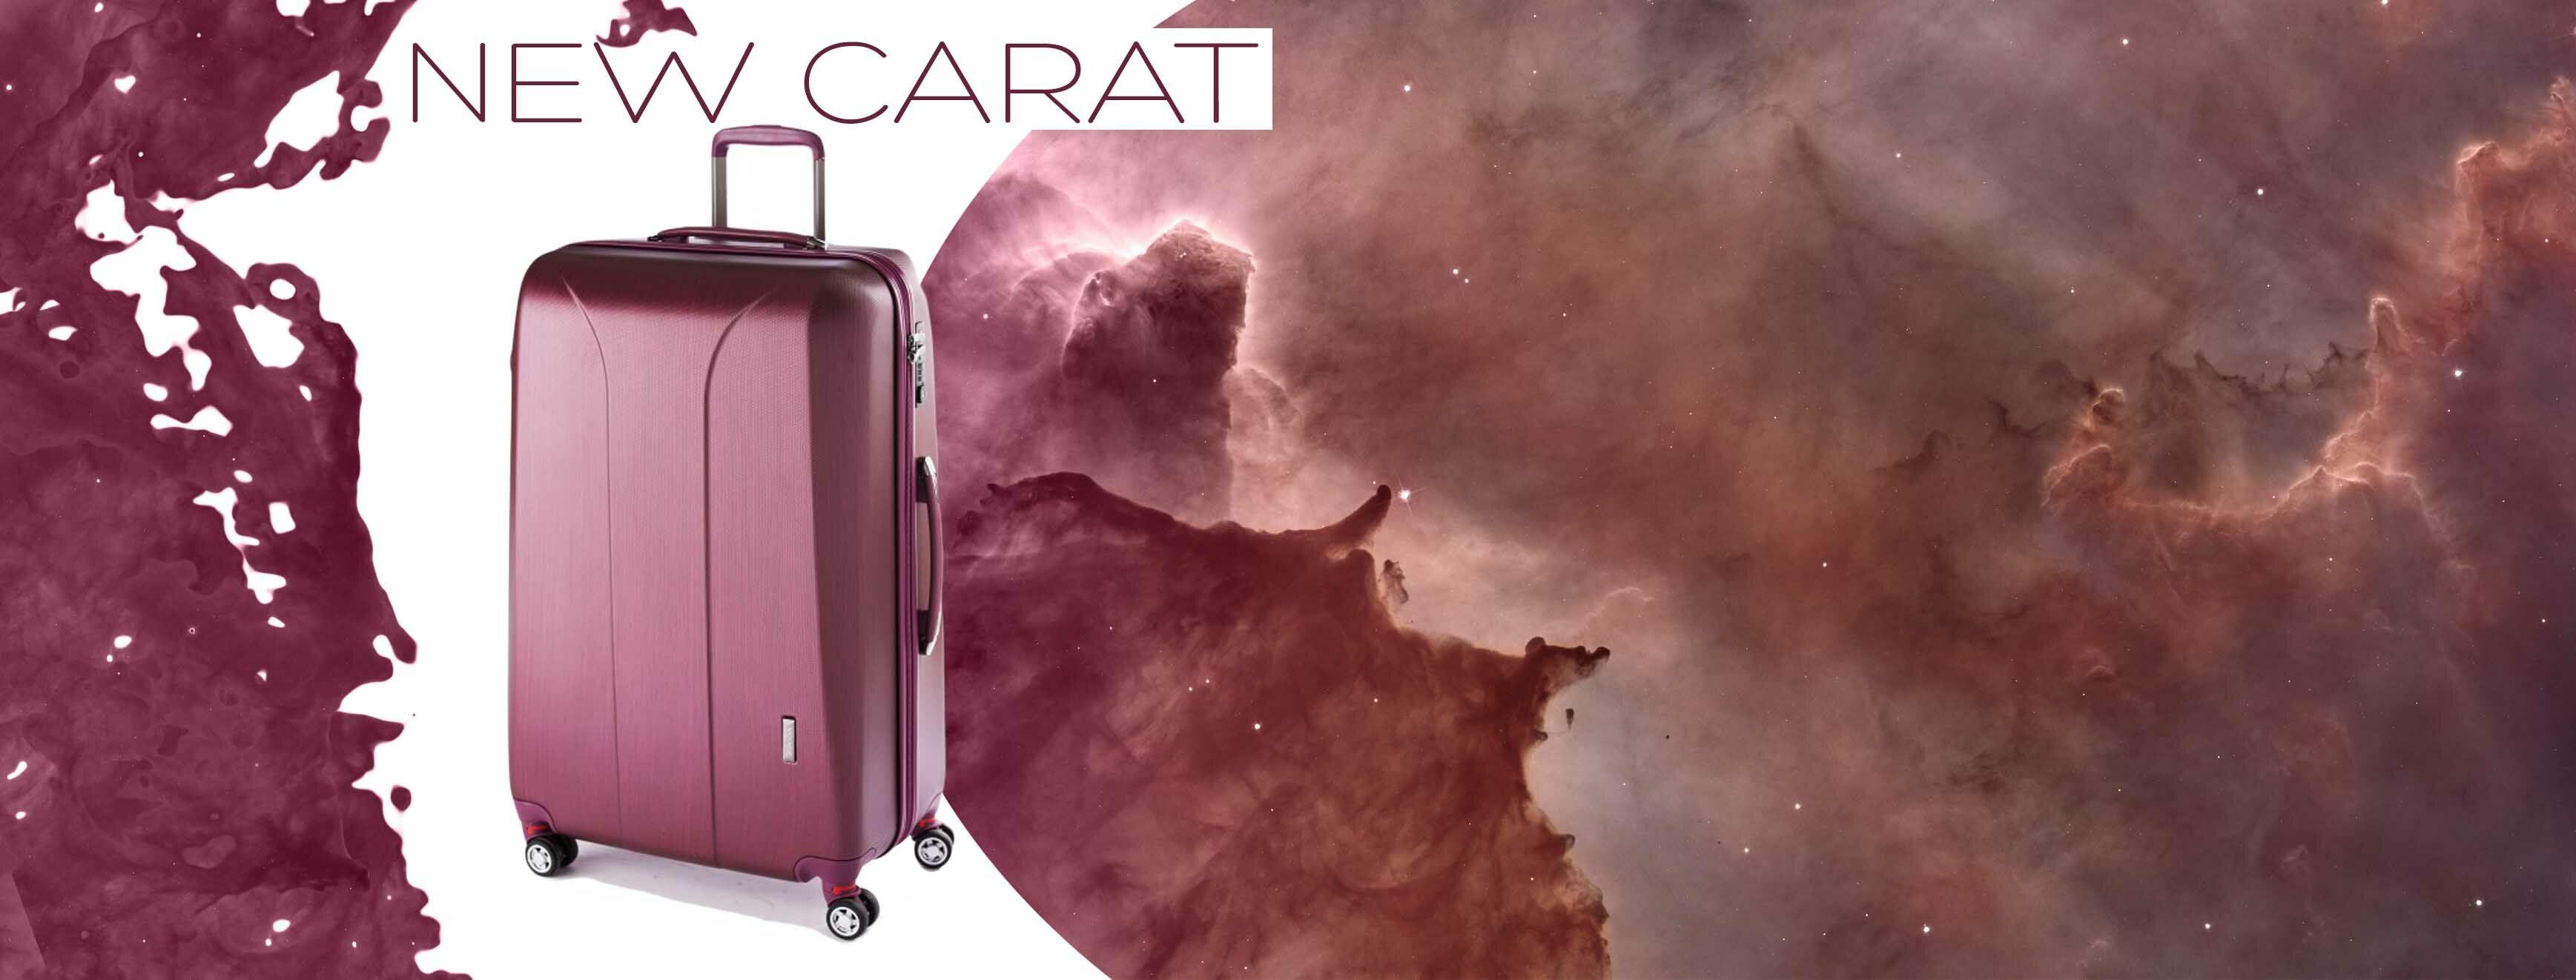 newcarat